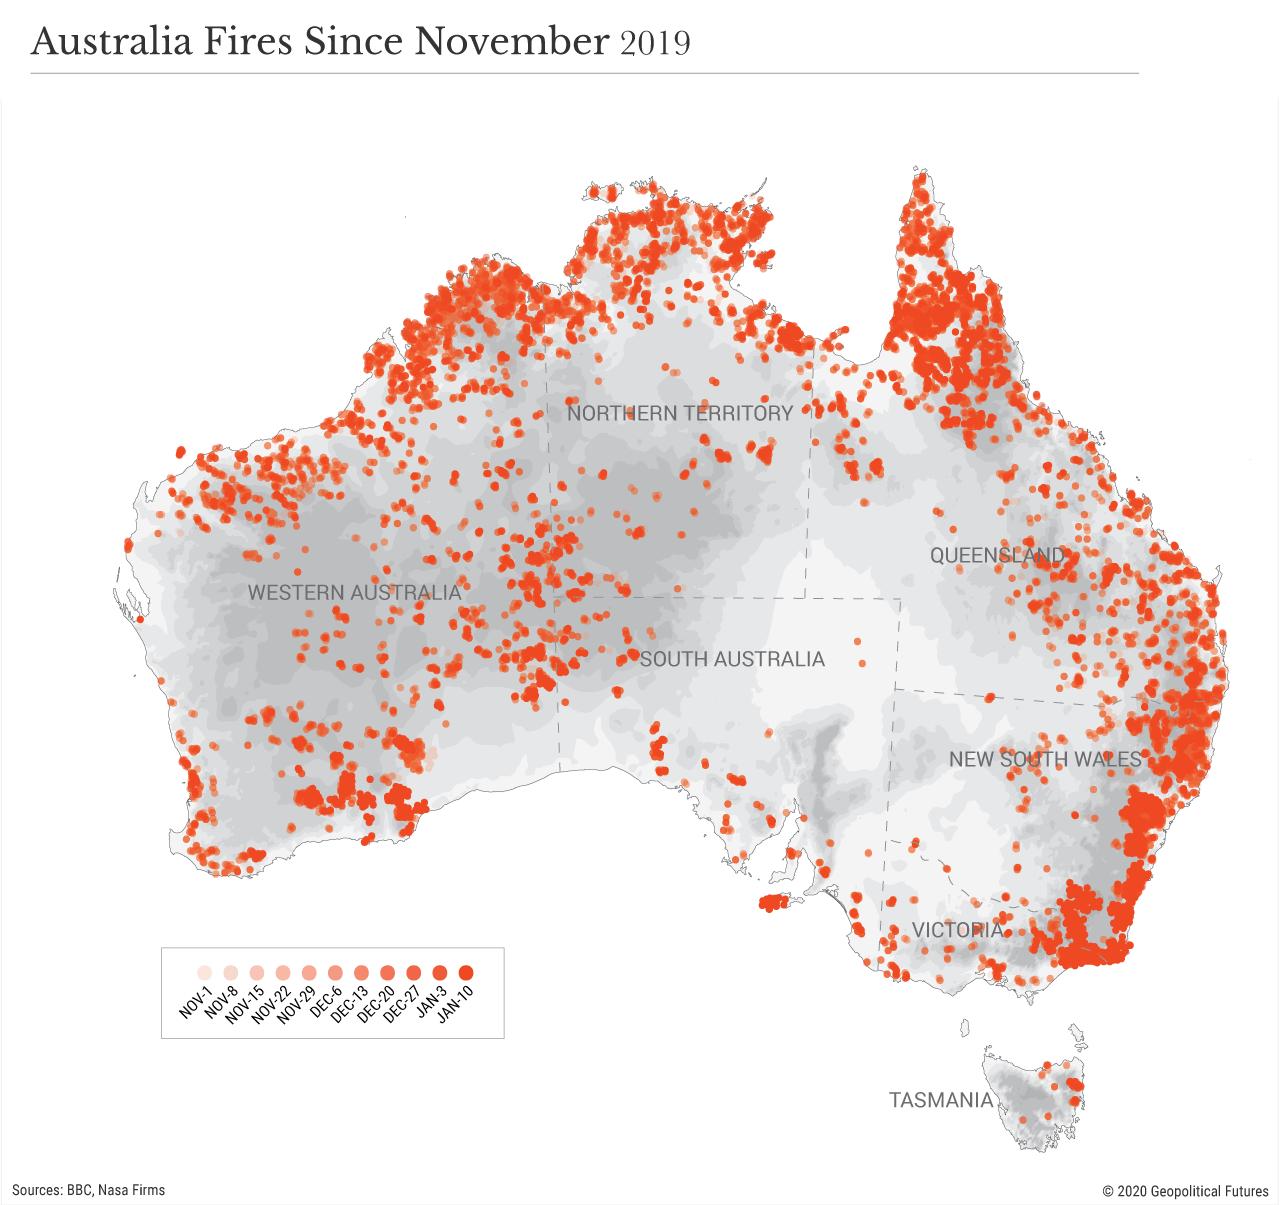 Australia Fires Since November 2019